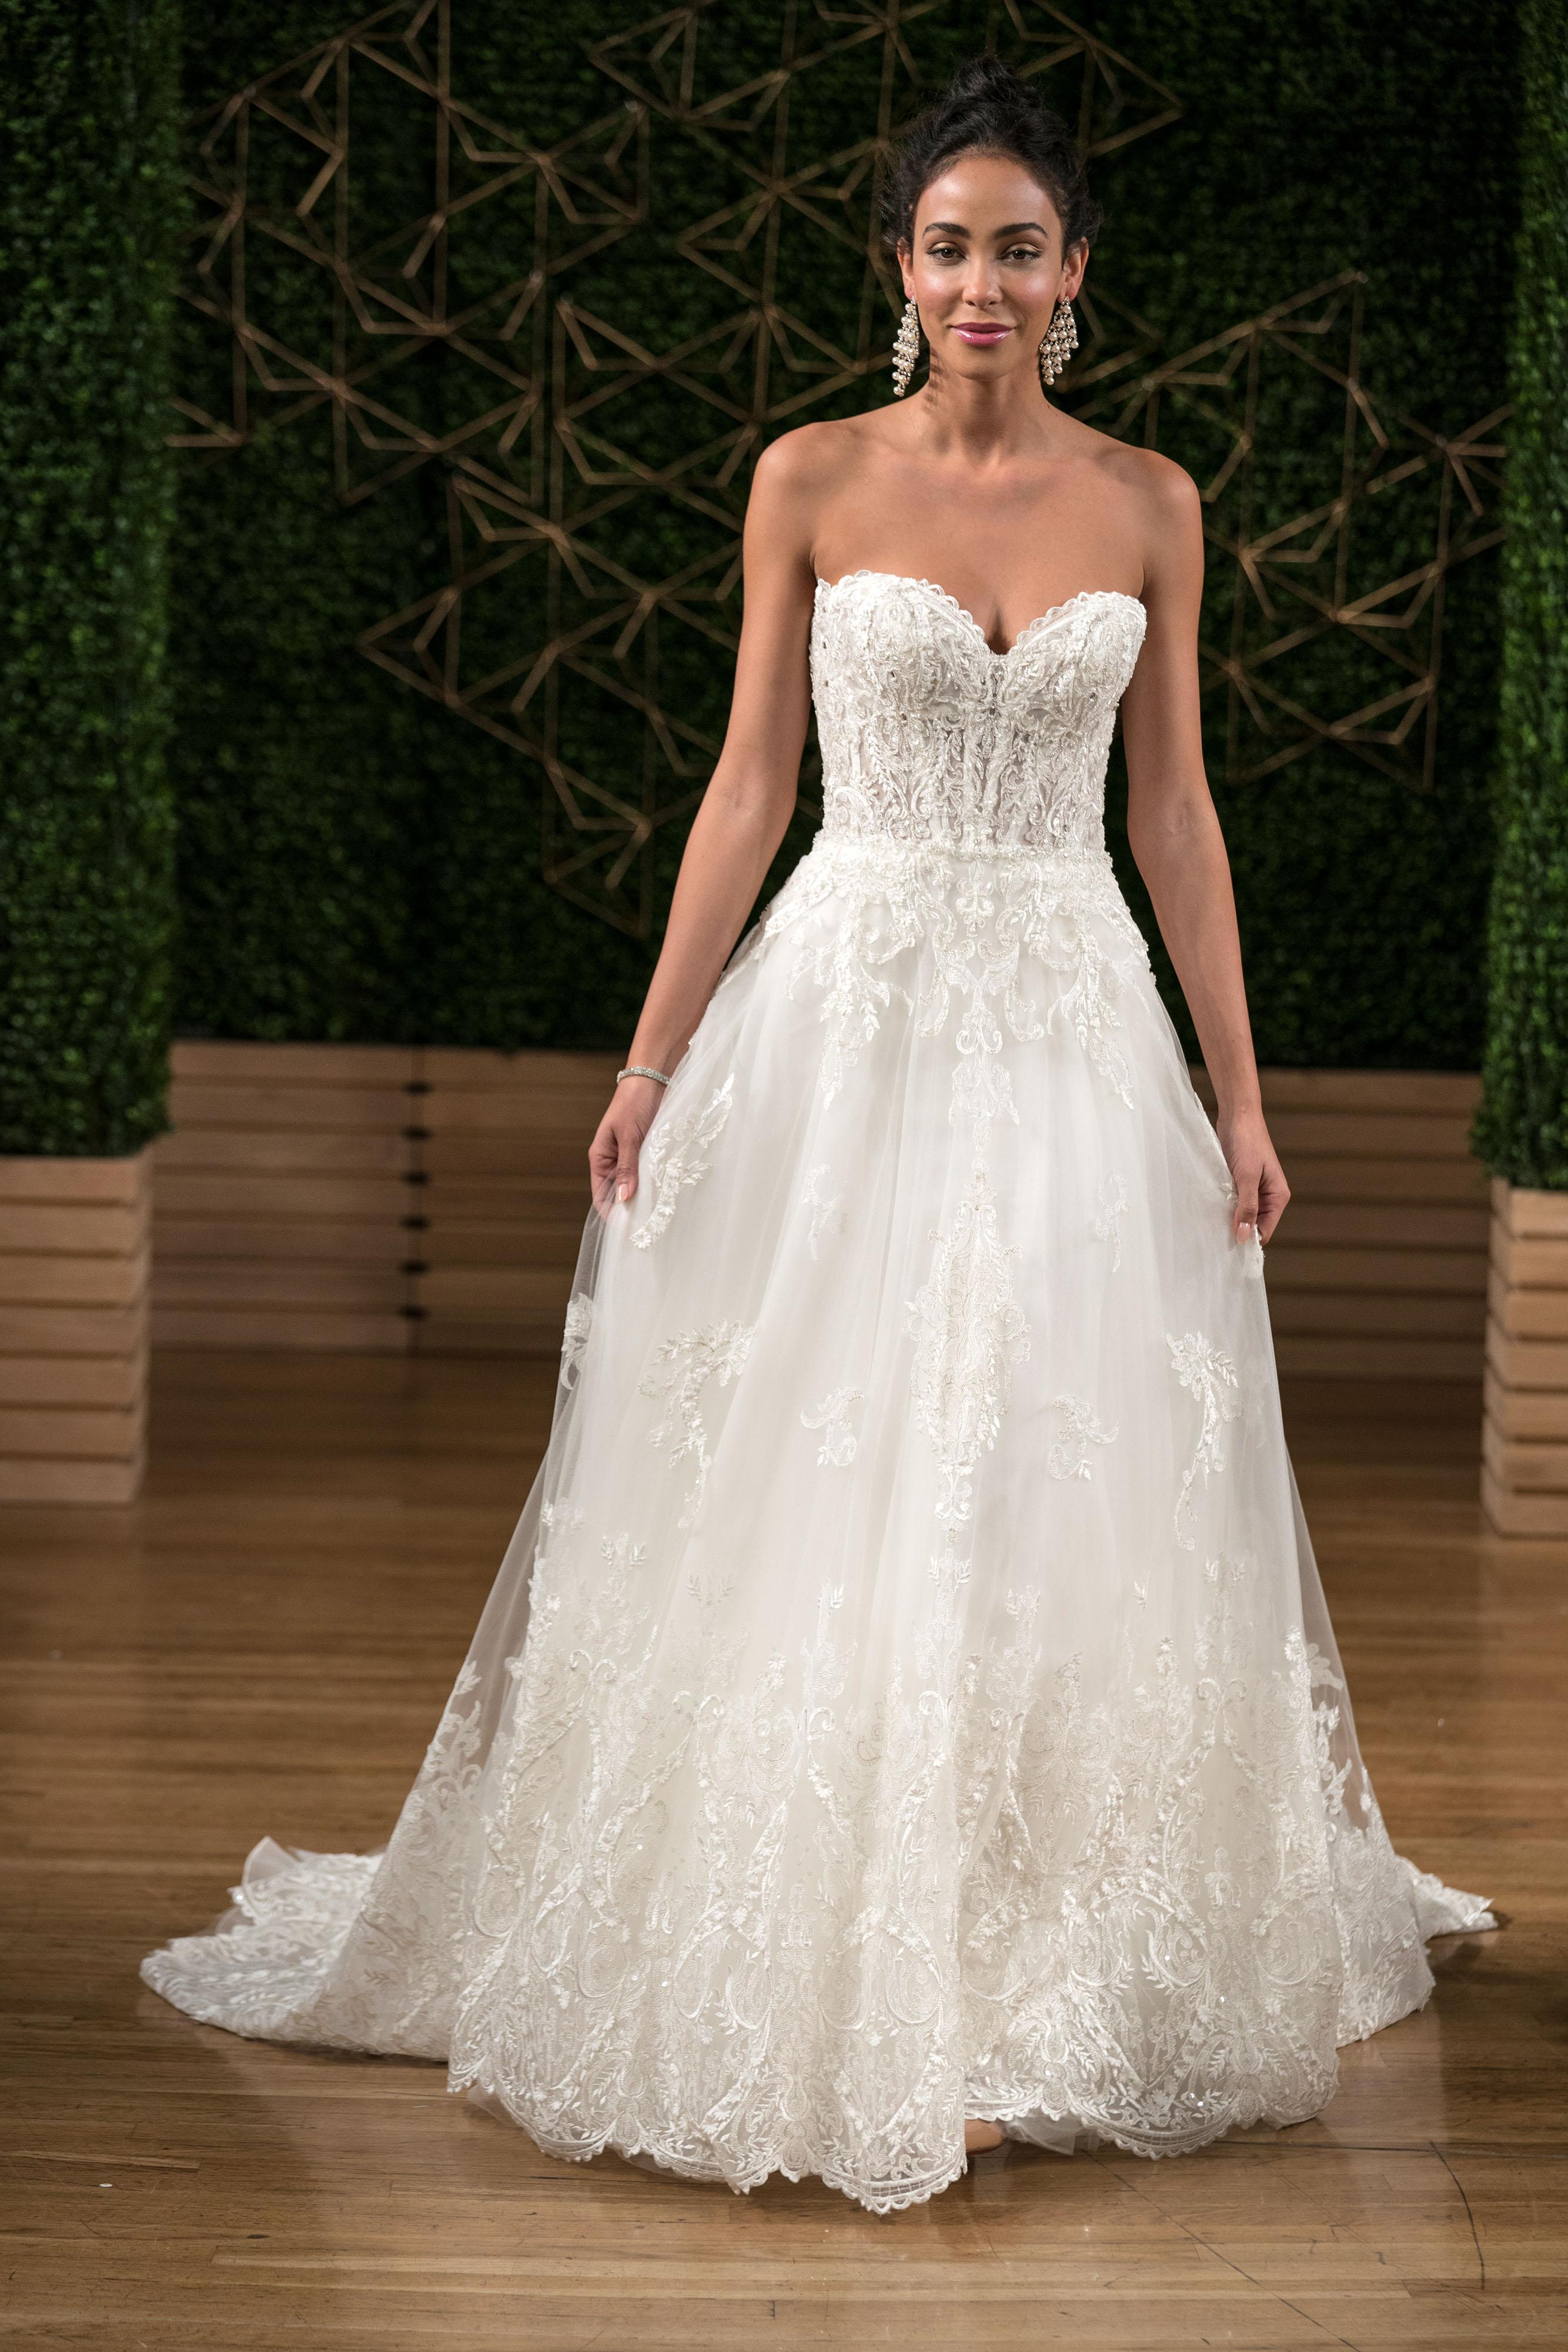 sottero midgley wedding dress fall 2018 sweetheart lace a-line